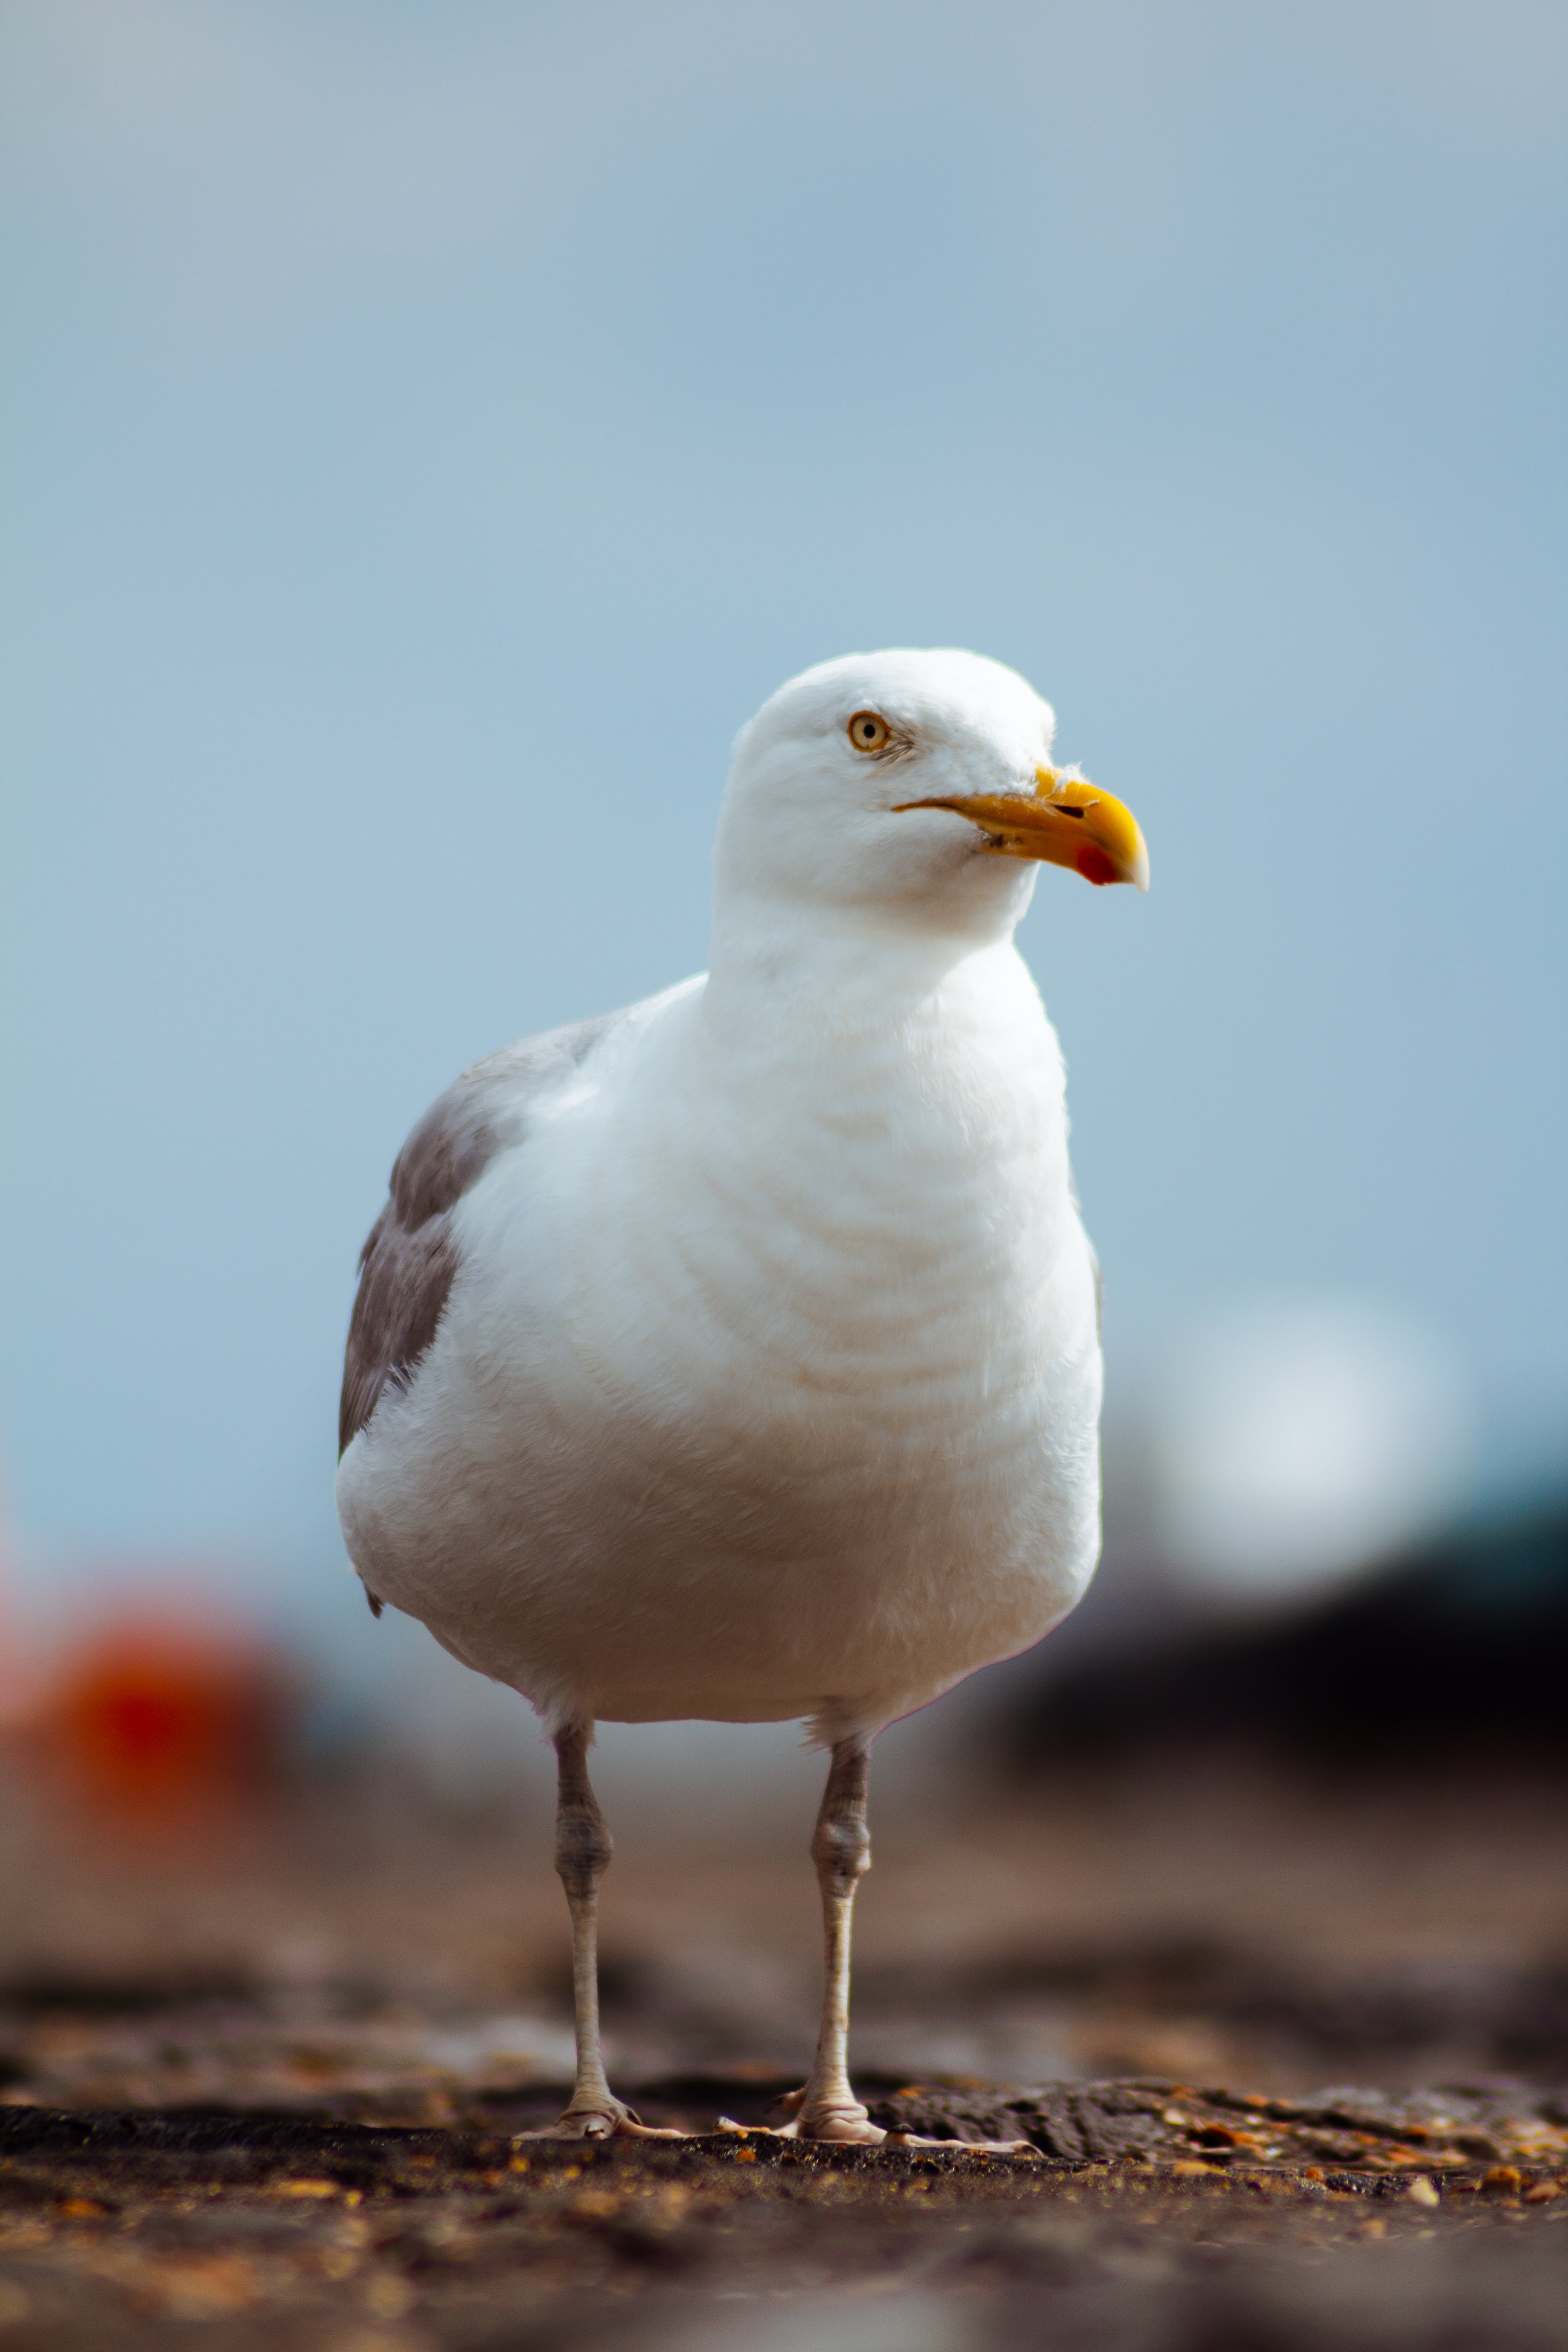 Free stock photo of animal, bird, birds, feathers